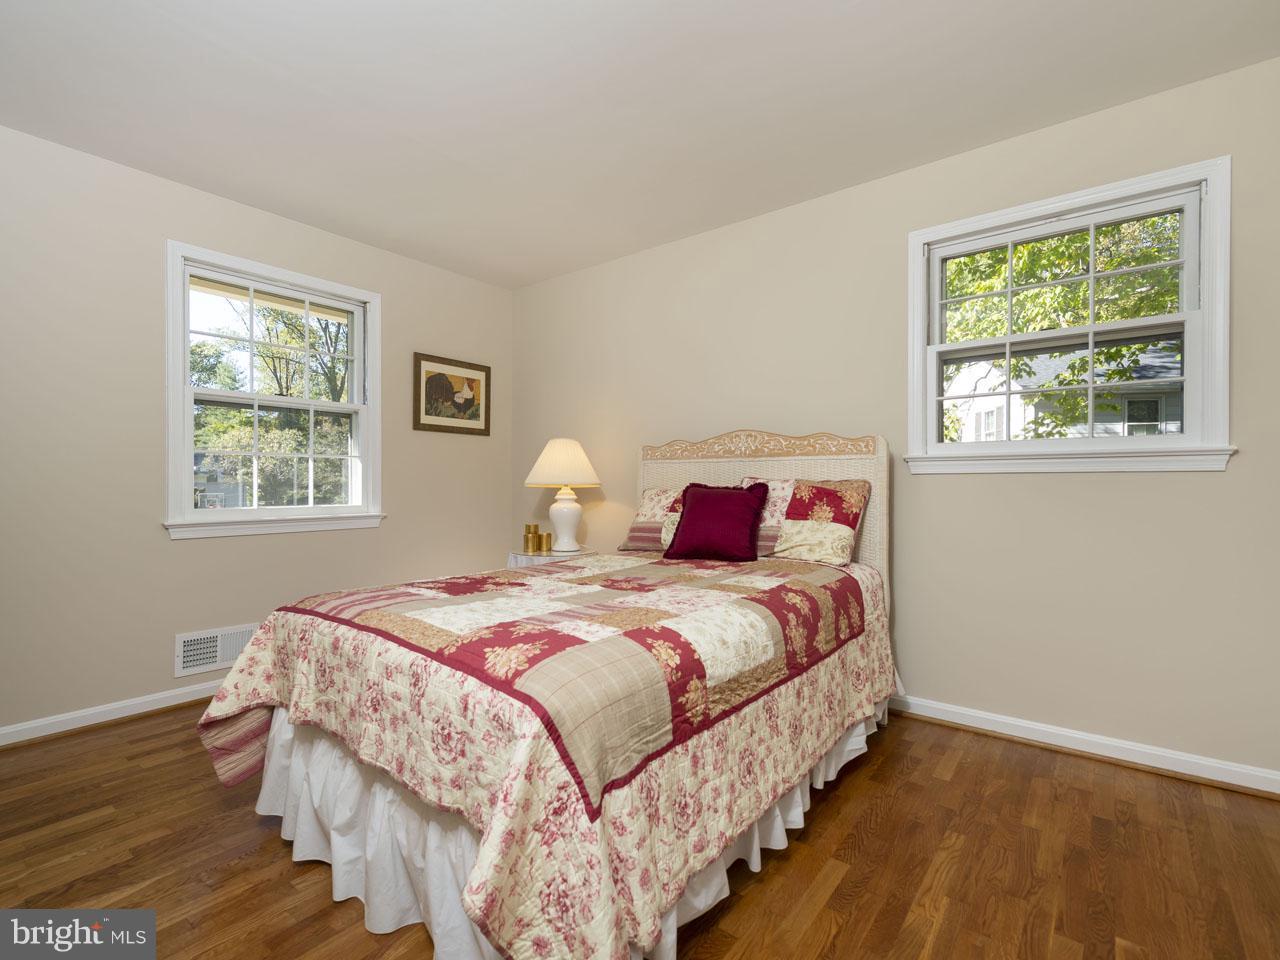 1010014728-300953035225-2021-09-05-13-50-26  |   | Annandale Delaware Real Estate For Sale | MLS# 1010014728  - Best of Northern Virginia